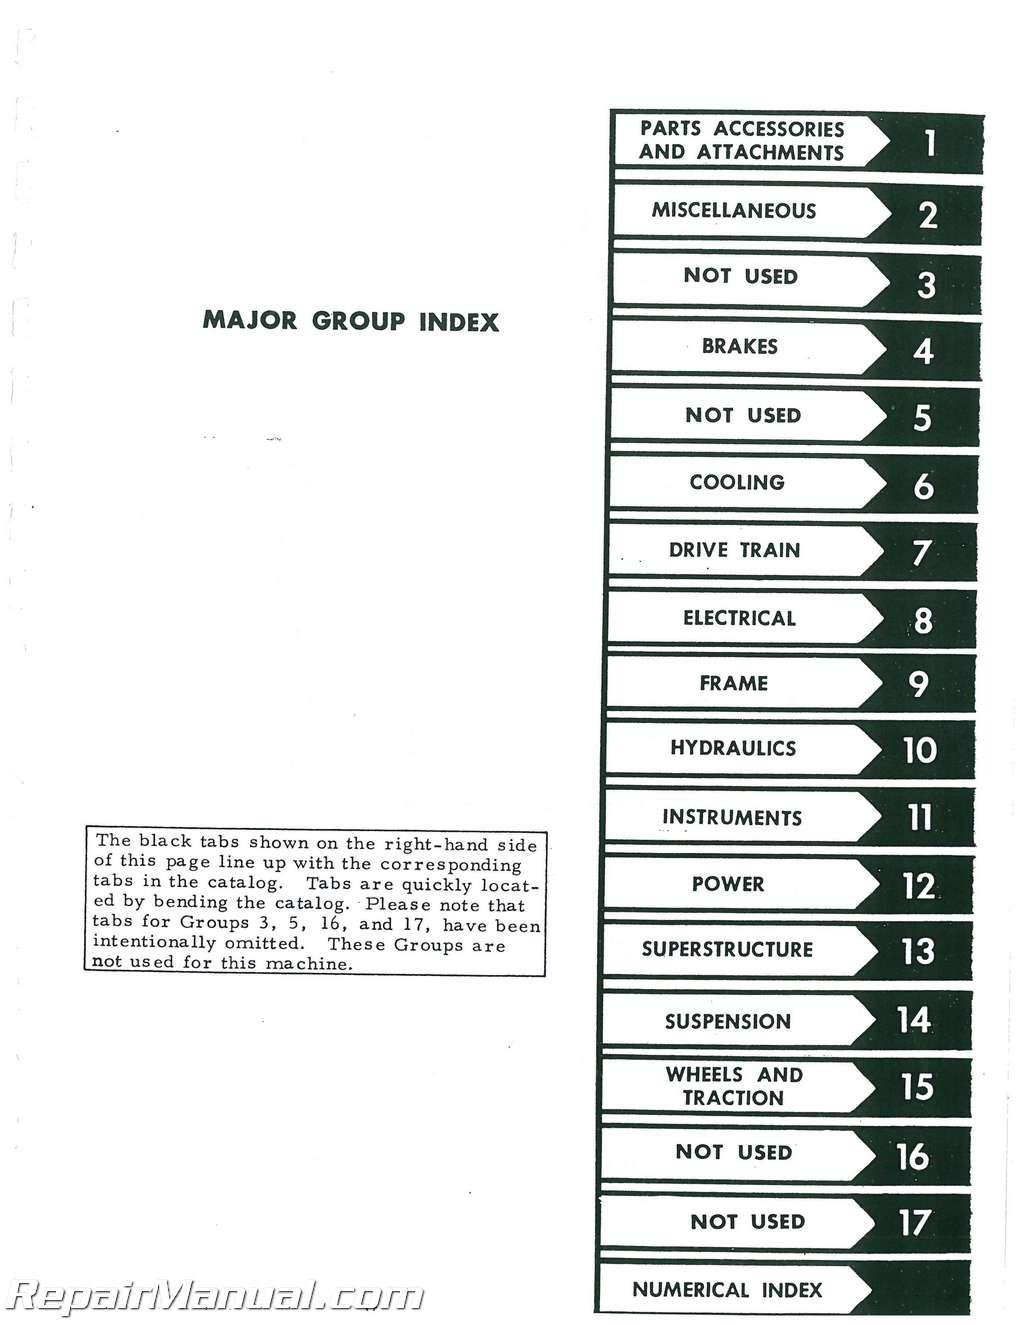 International 674 parts Manual